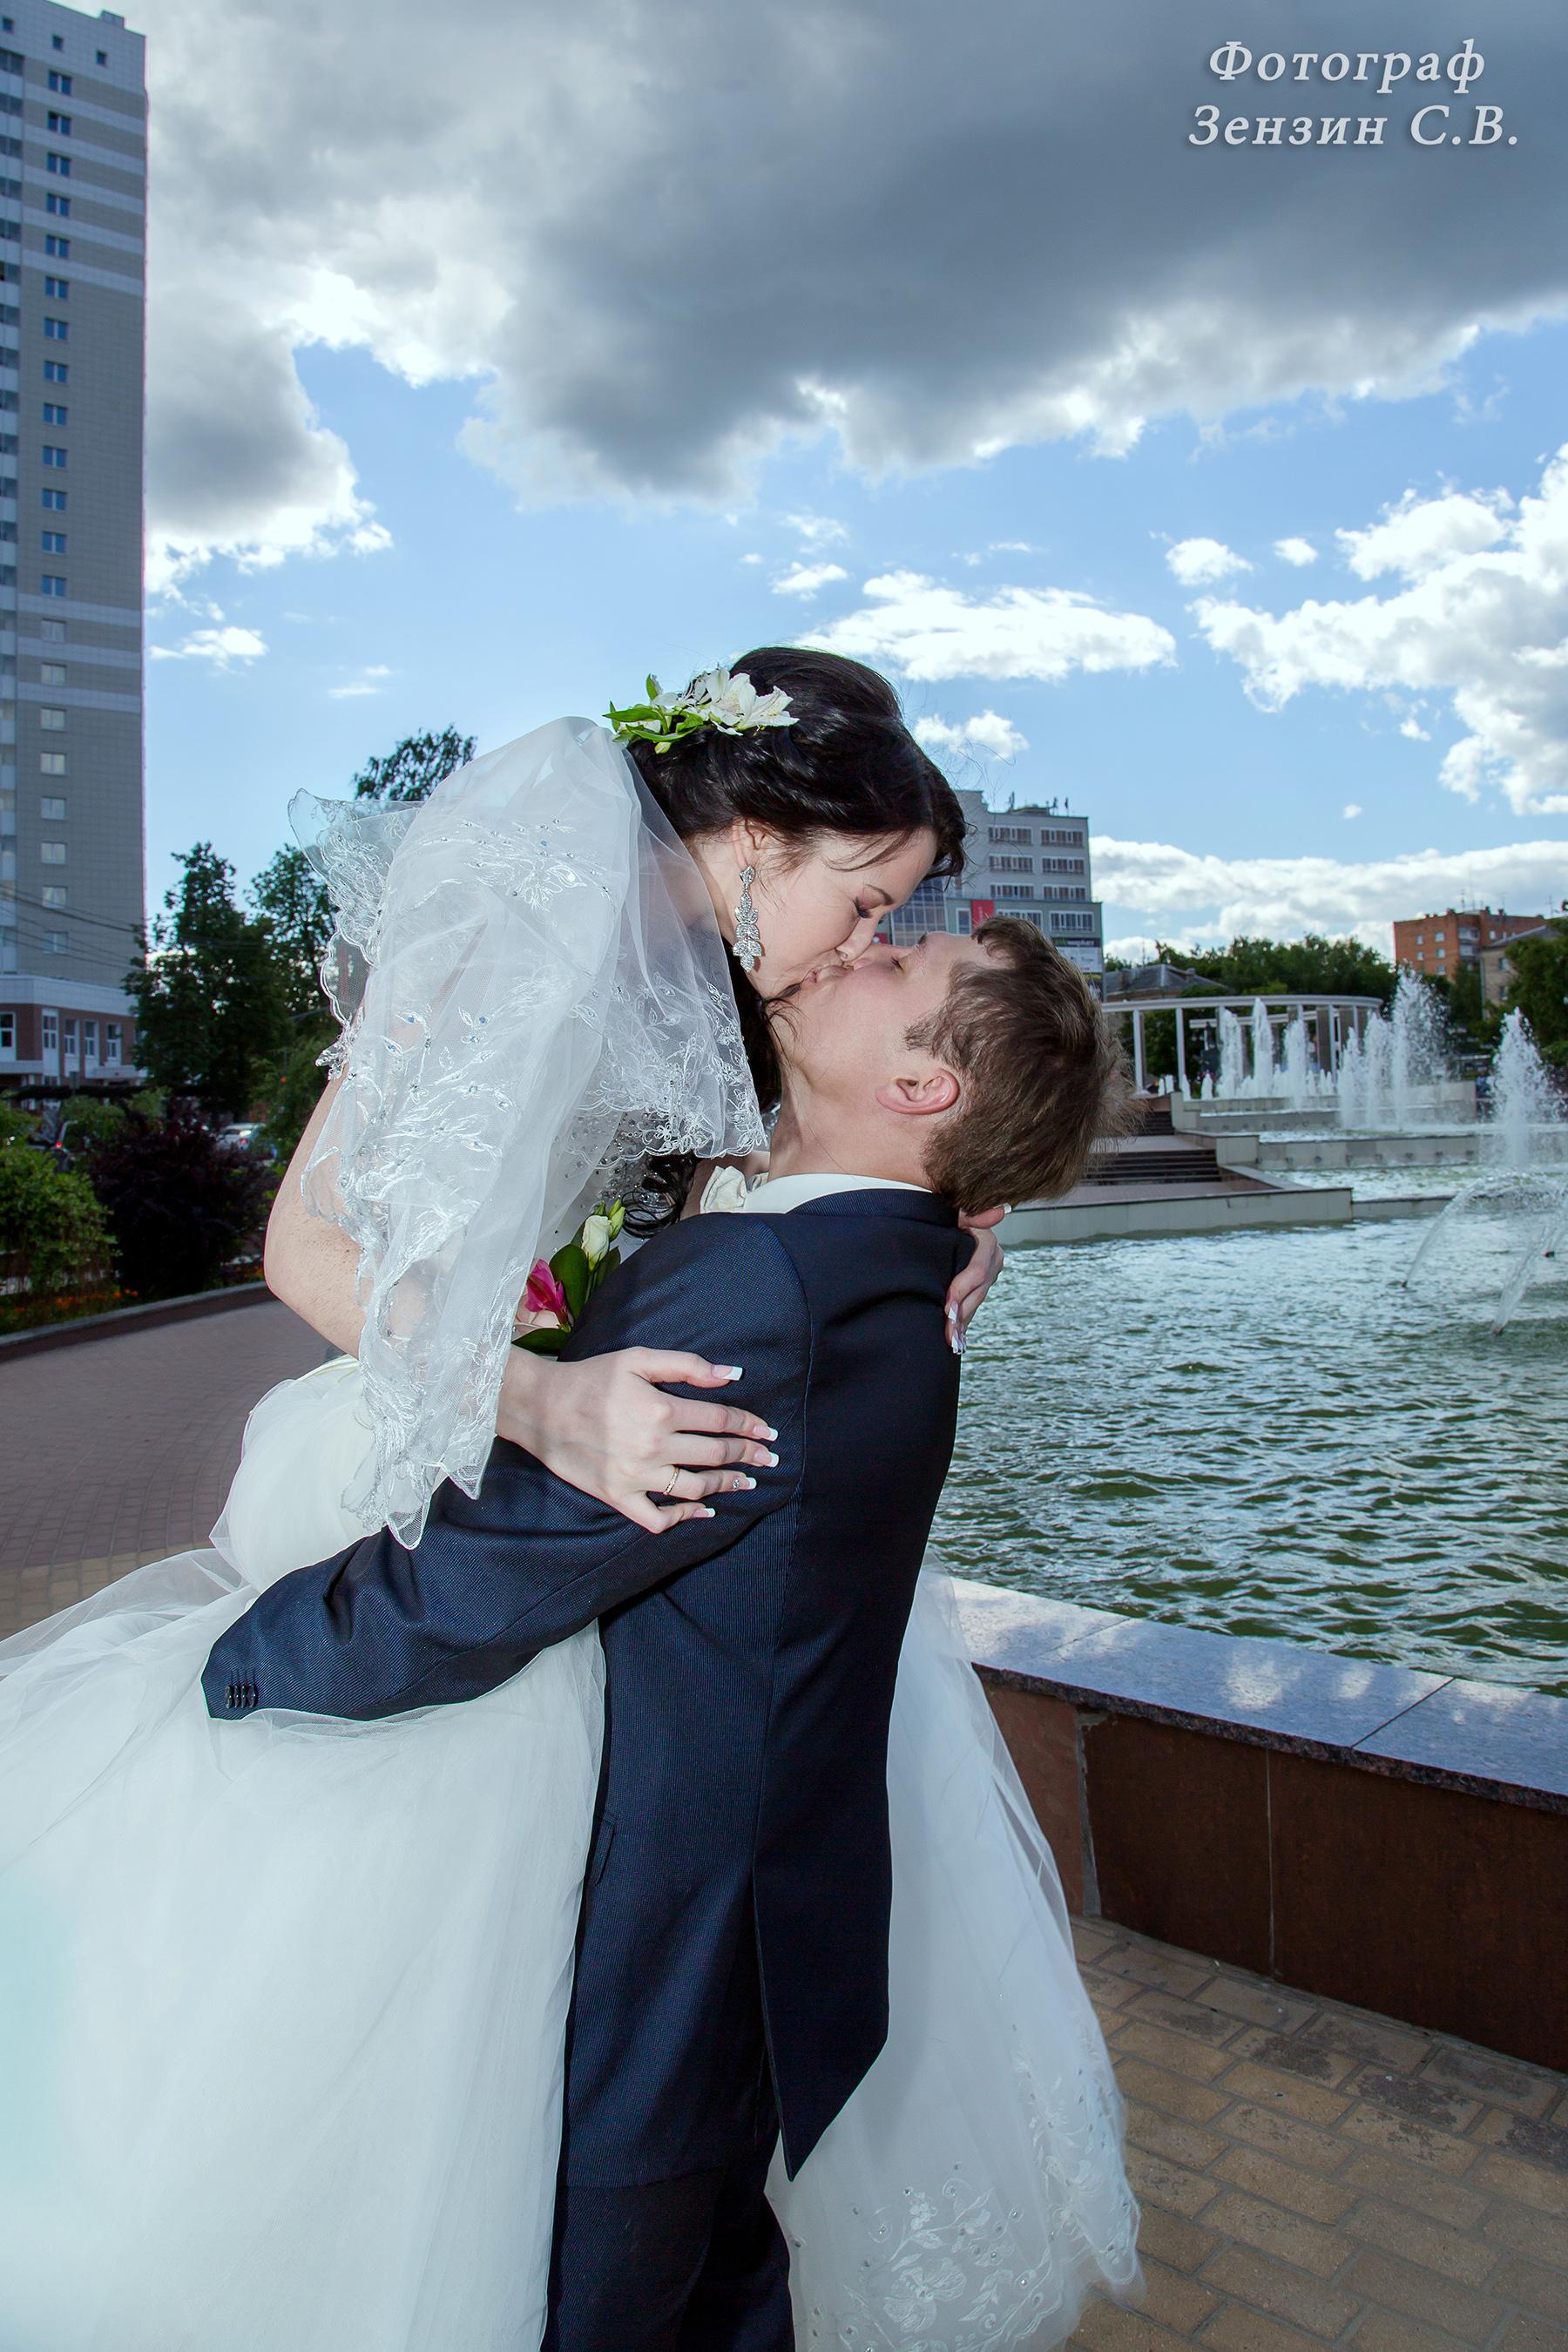 Свадьба Барнаул 06-06-2015 Ольга + Алексей. фотограф Зензин С.В. http___www.photo-svz1